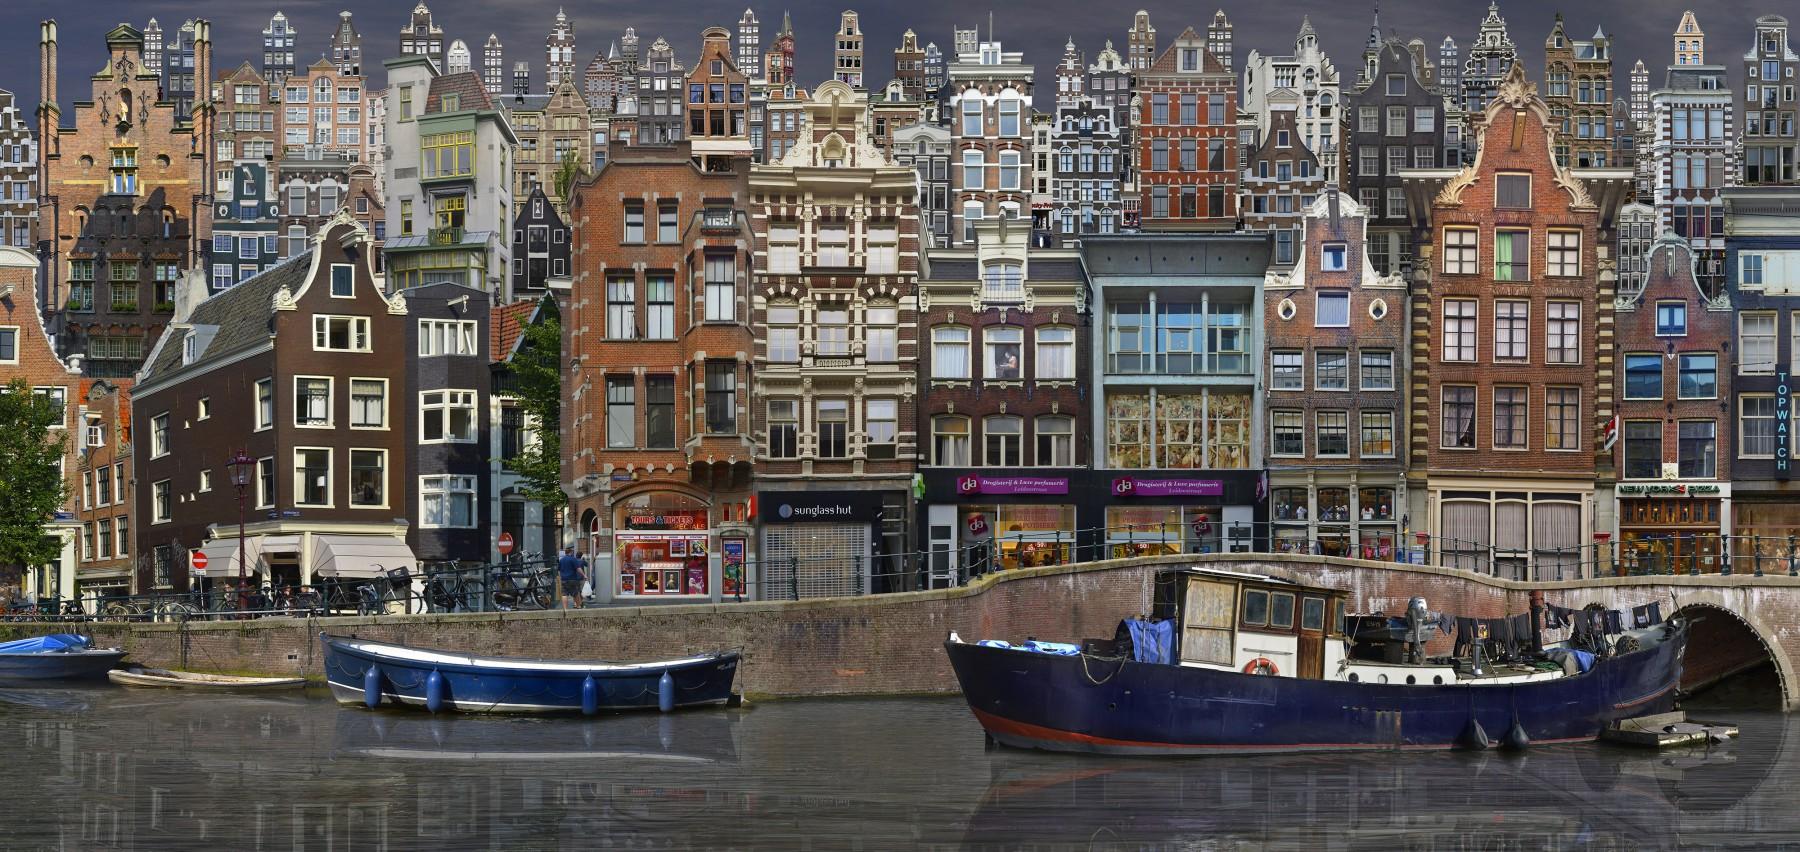 Balade-dAmsterdam-4